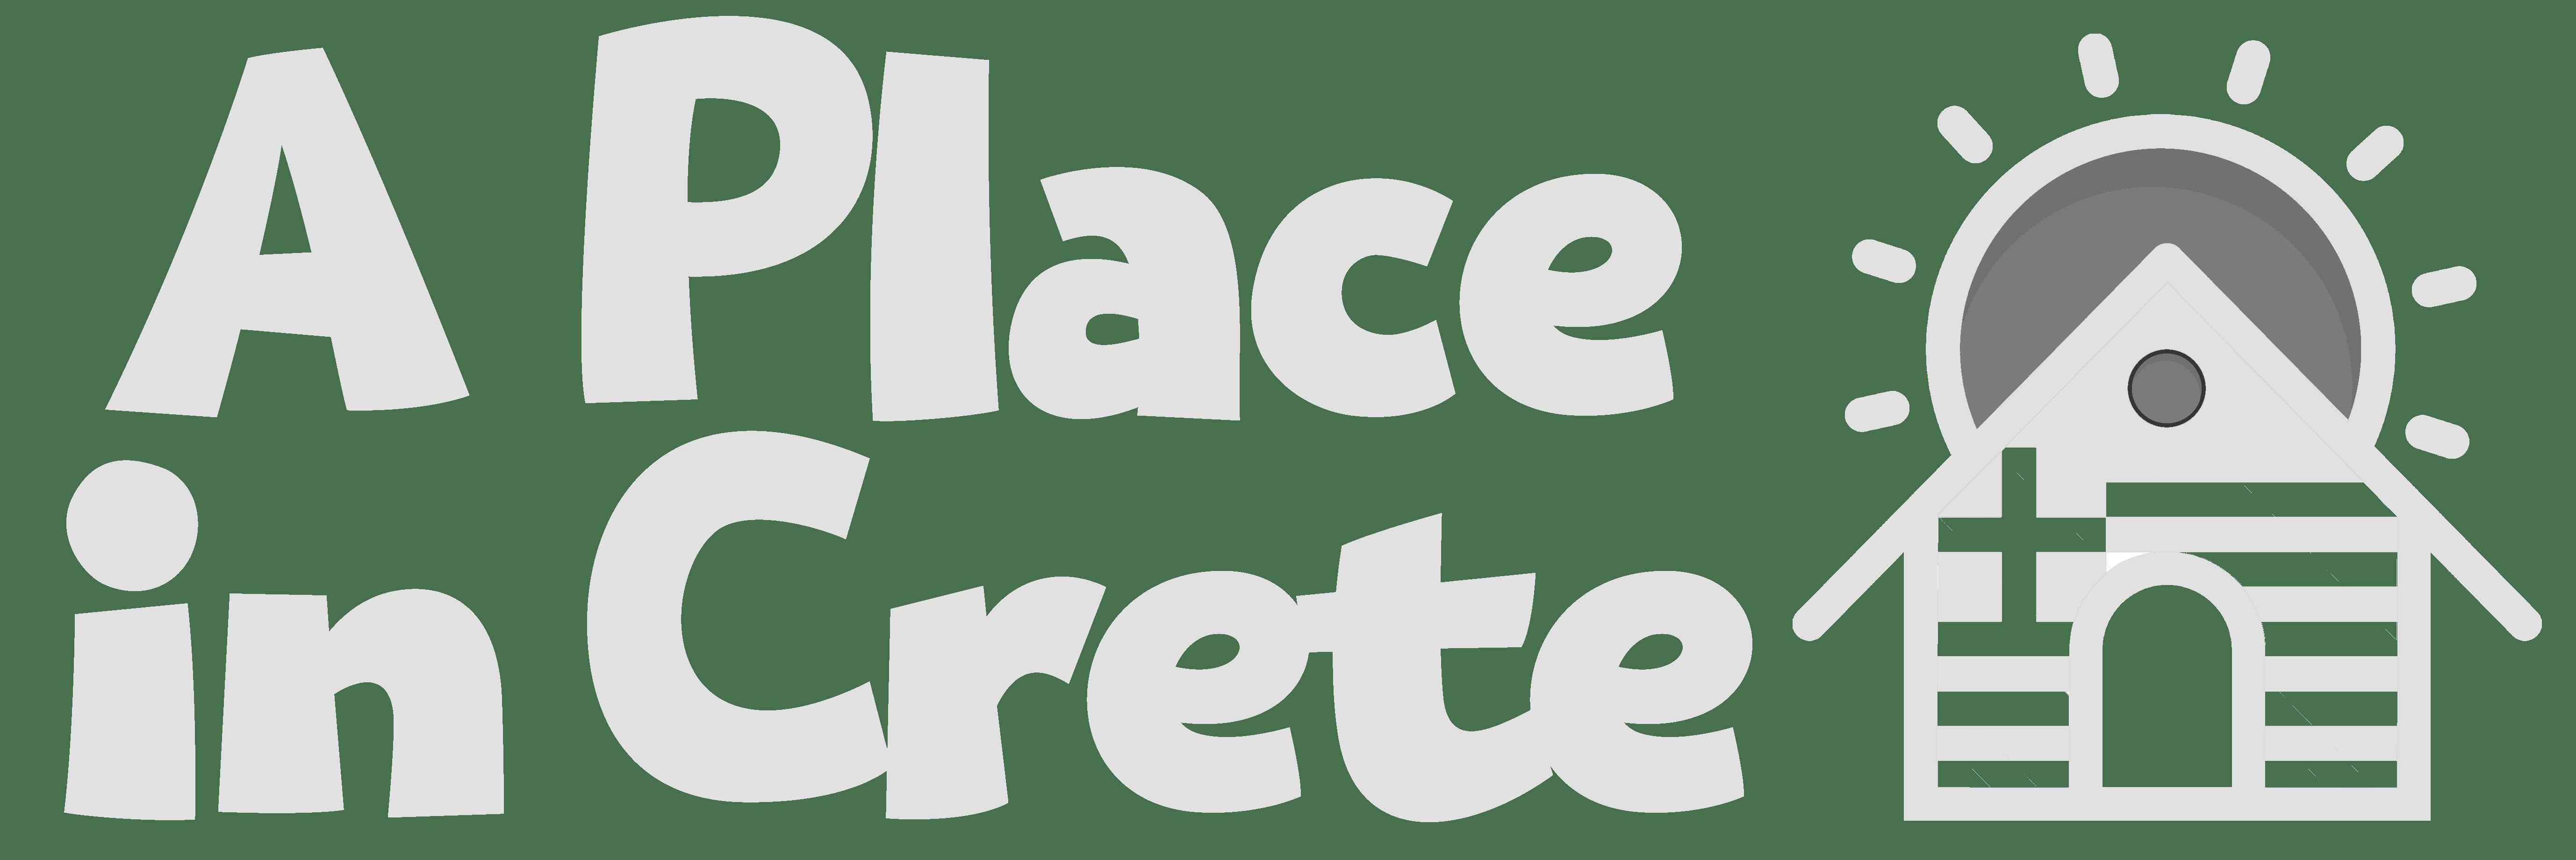 APlaceinCrete-Grey